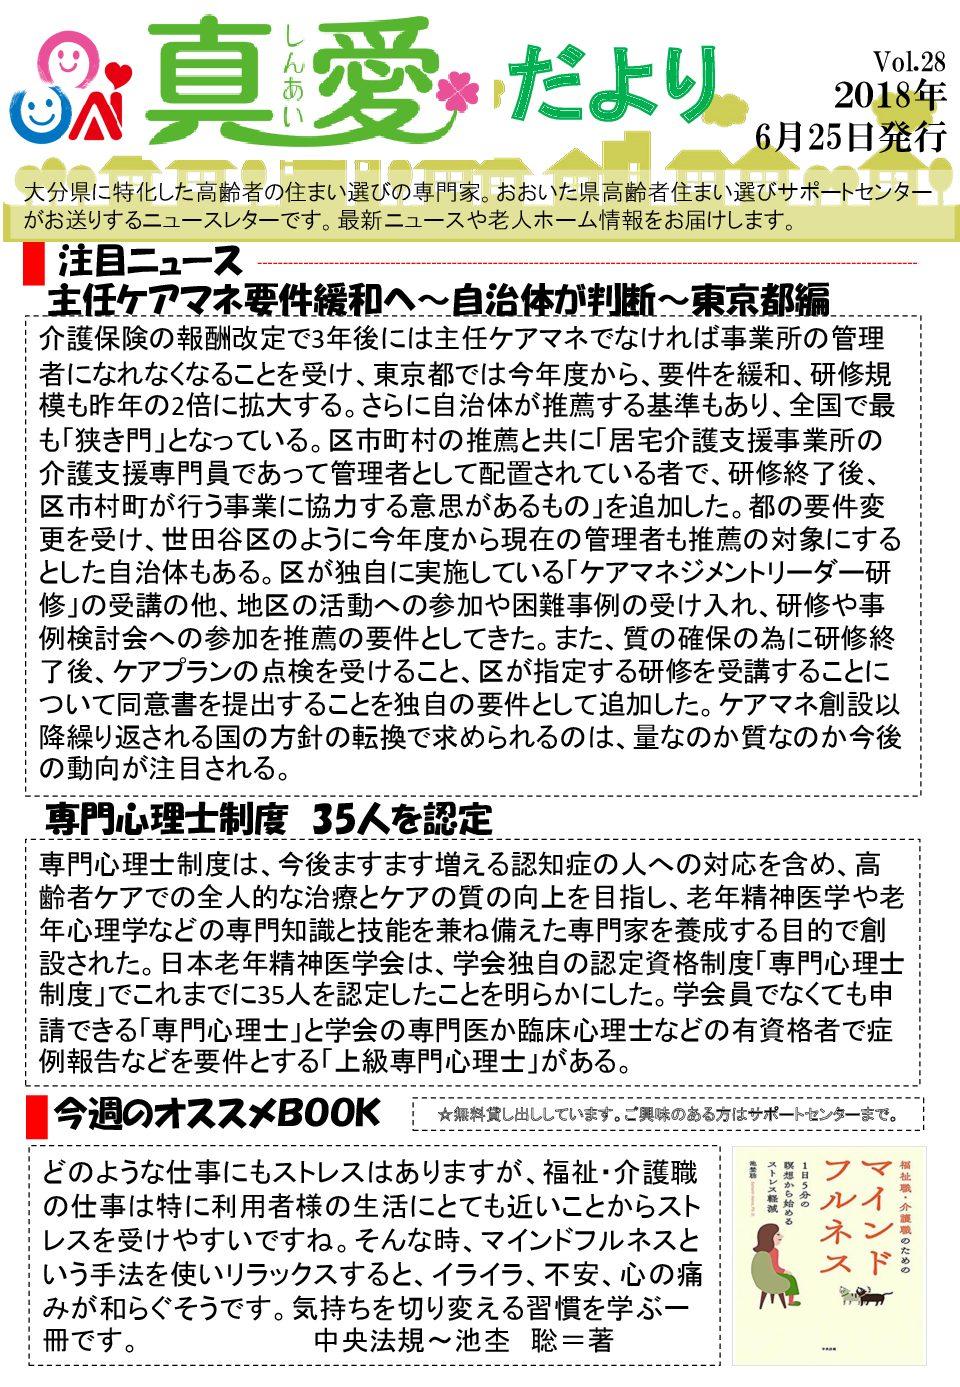 【Vol.28】 2018.06.25発行